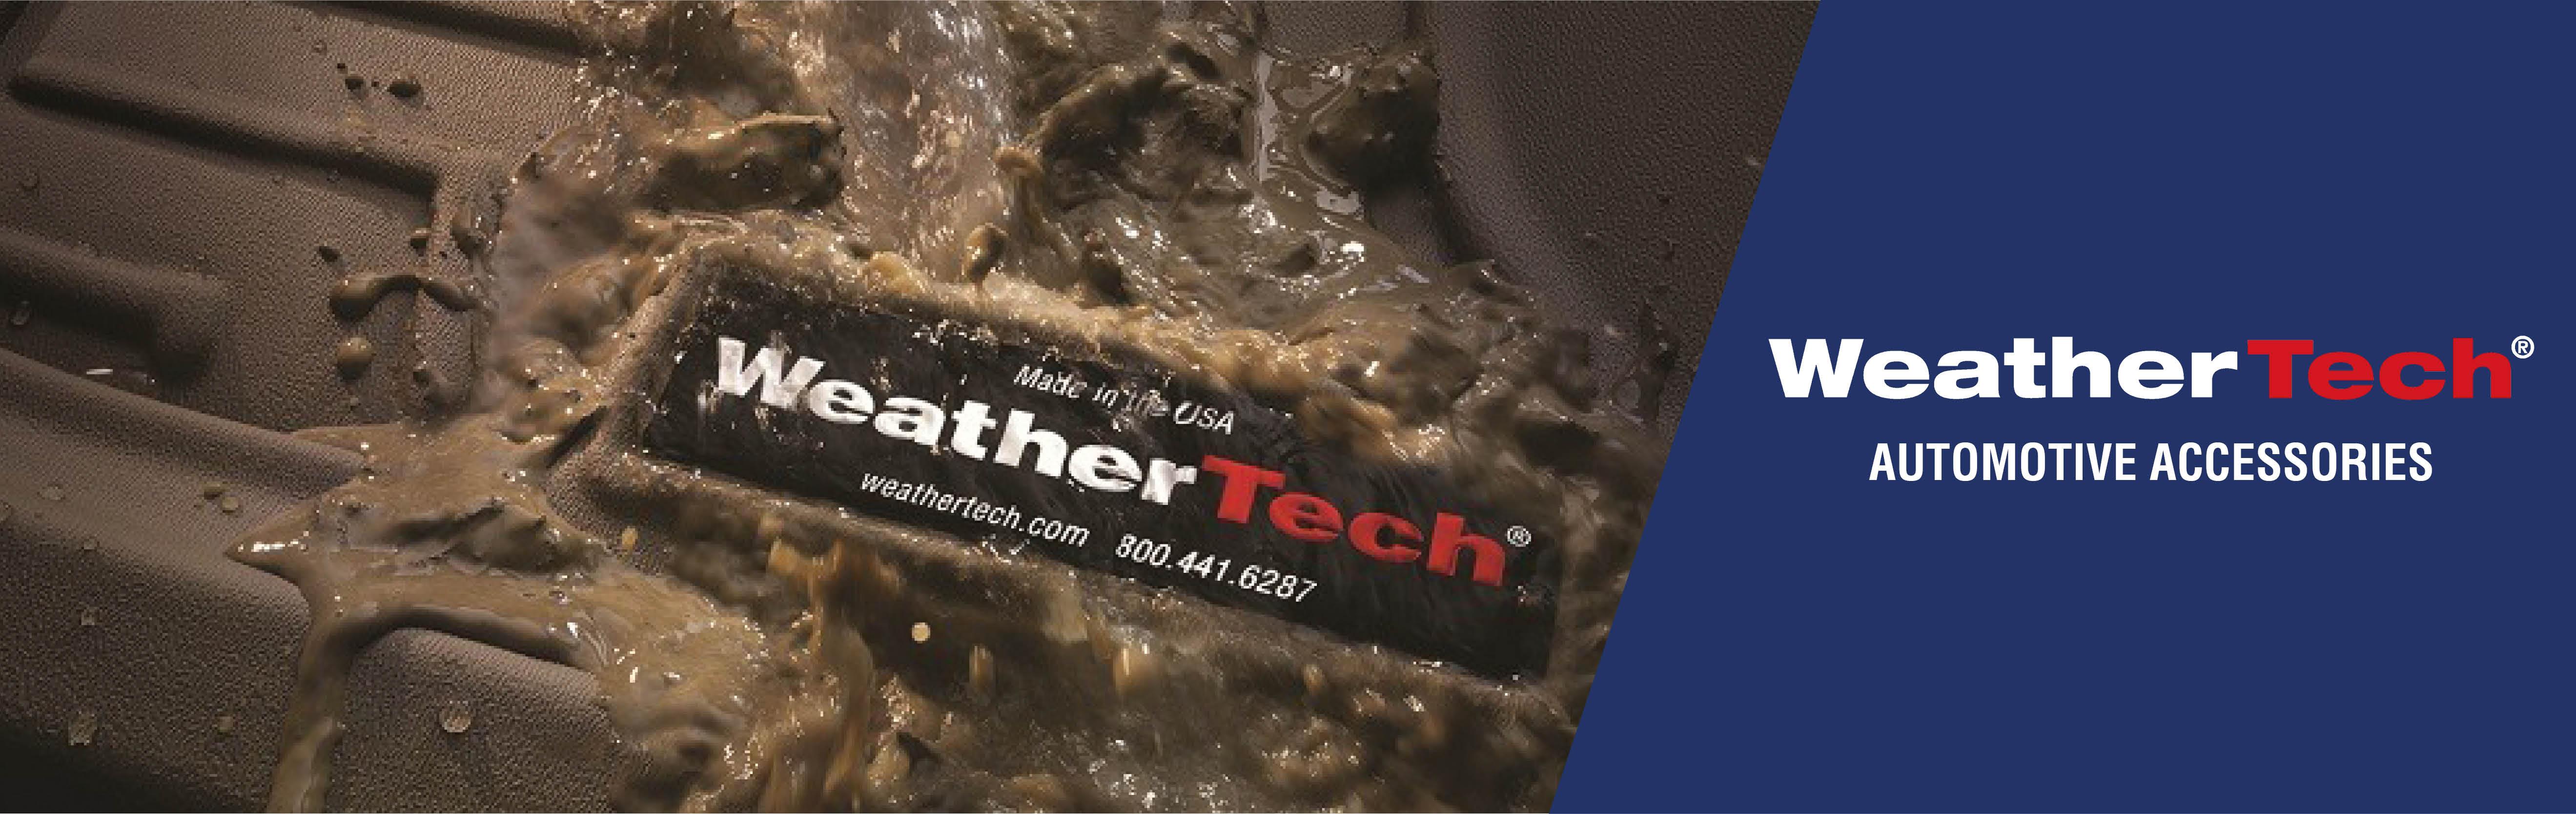 WeatherTech-200-dpi4